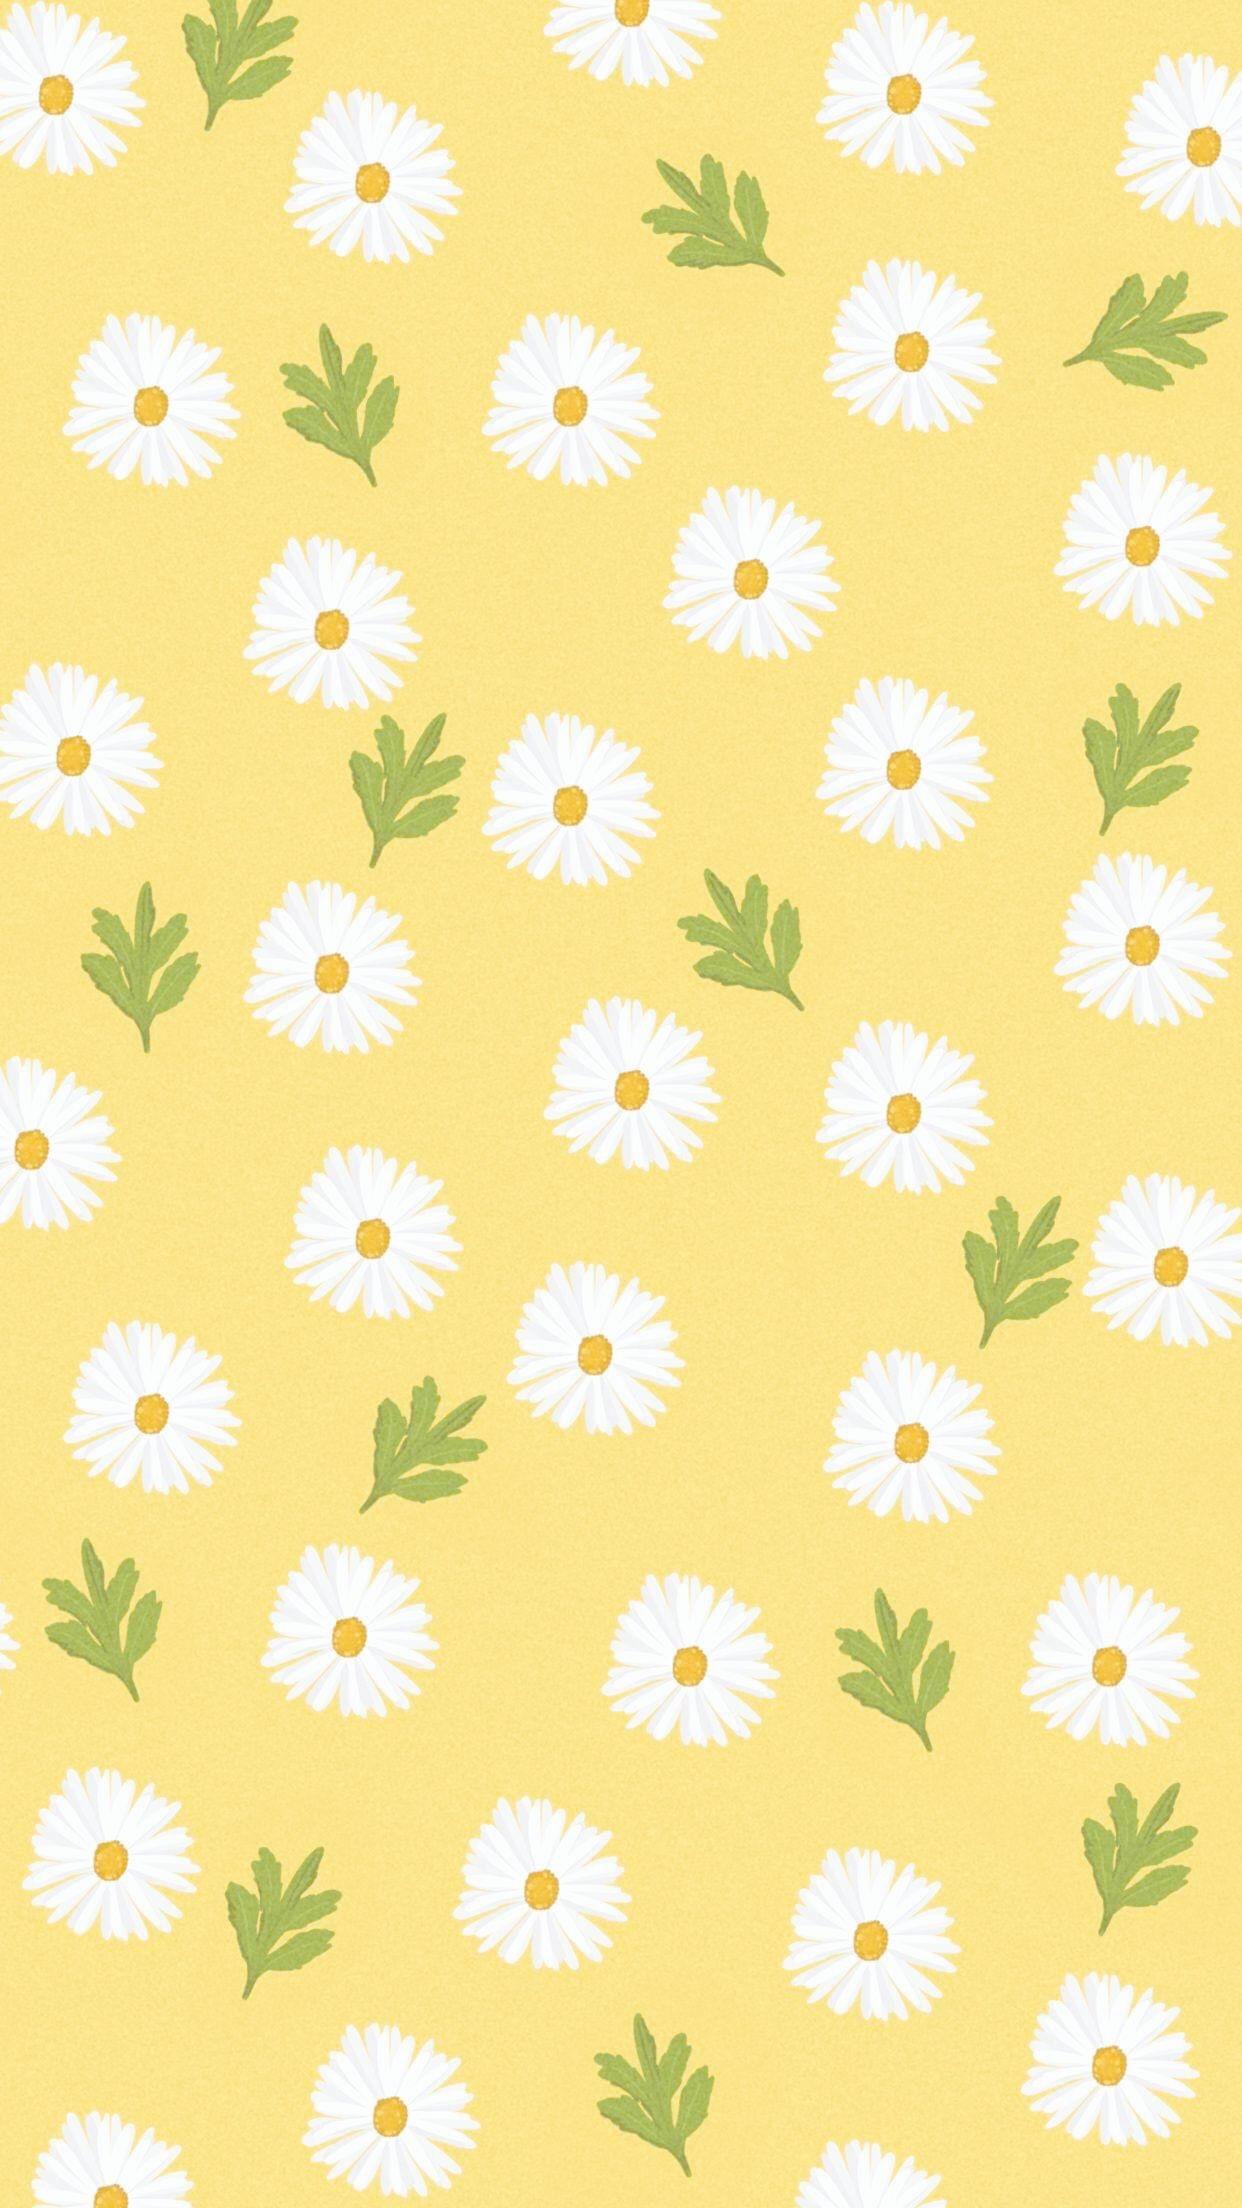 Nature White Daisy Flower iPhone 7 wallpaper Flowers